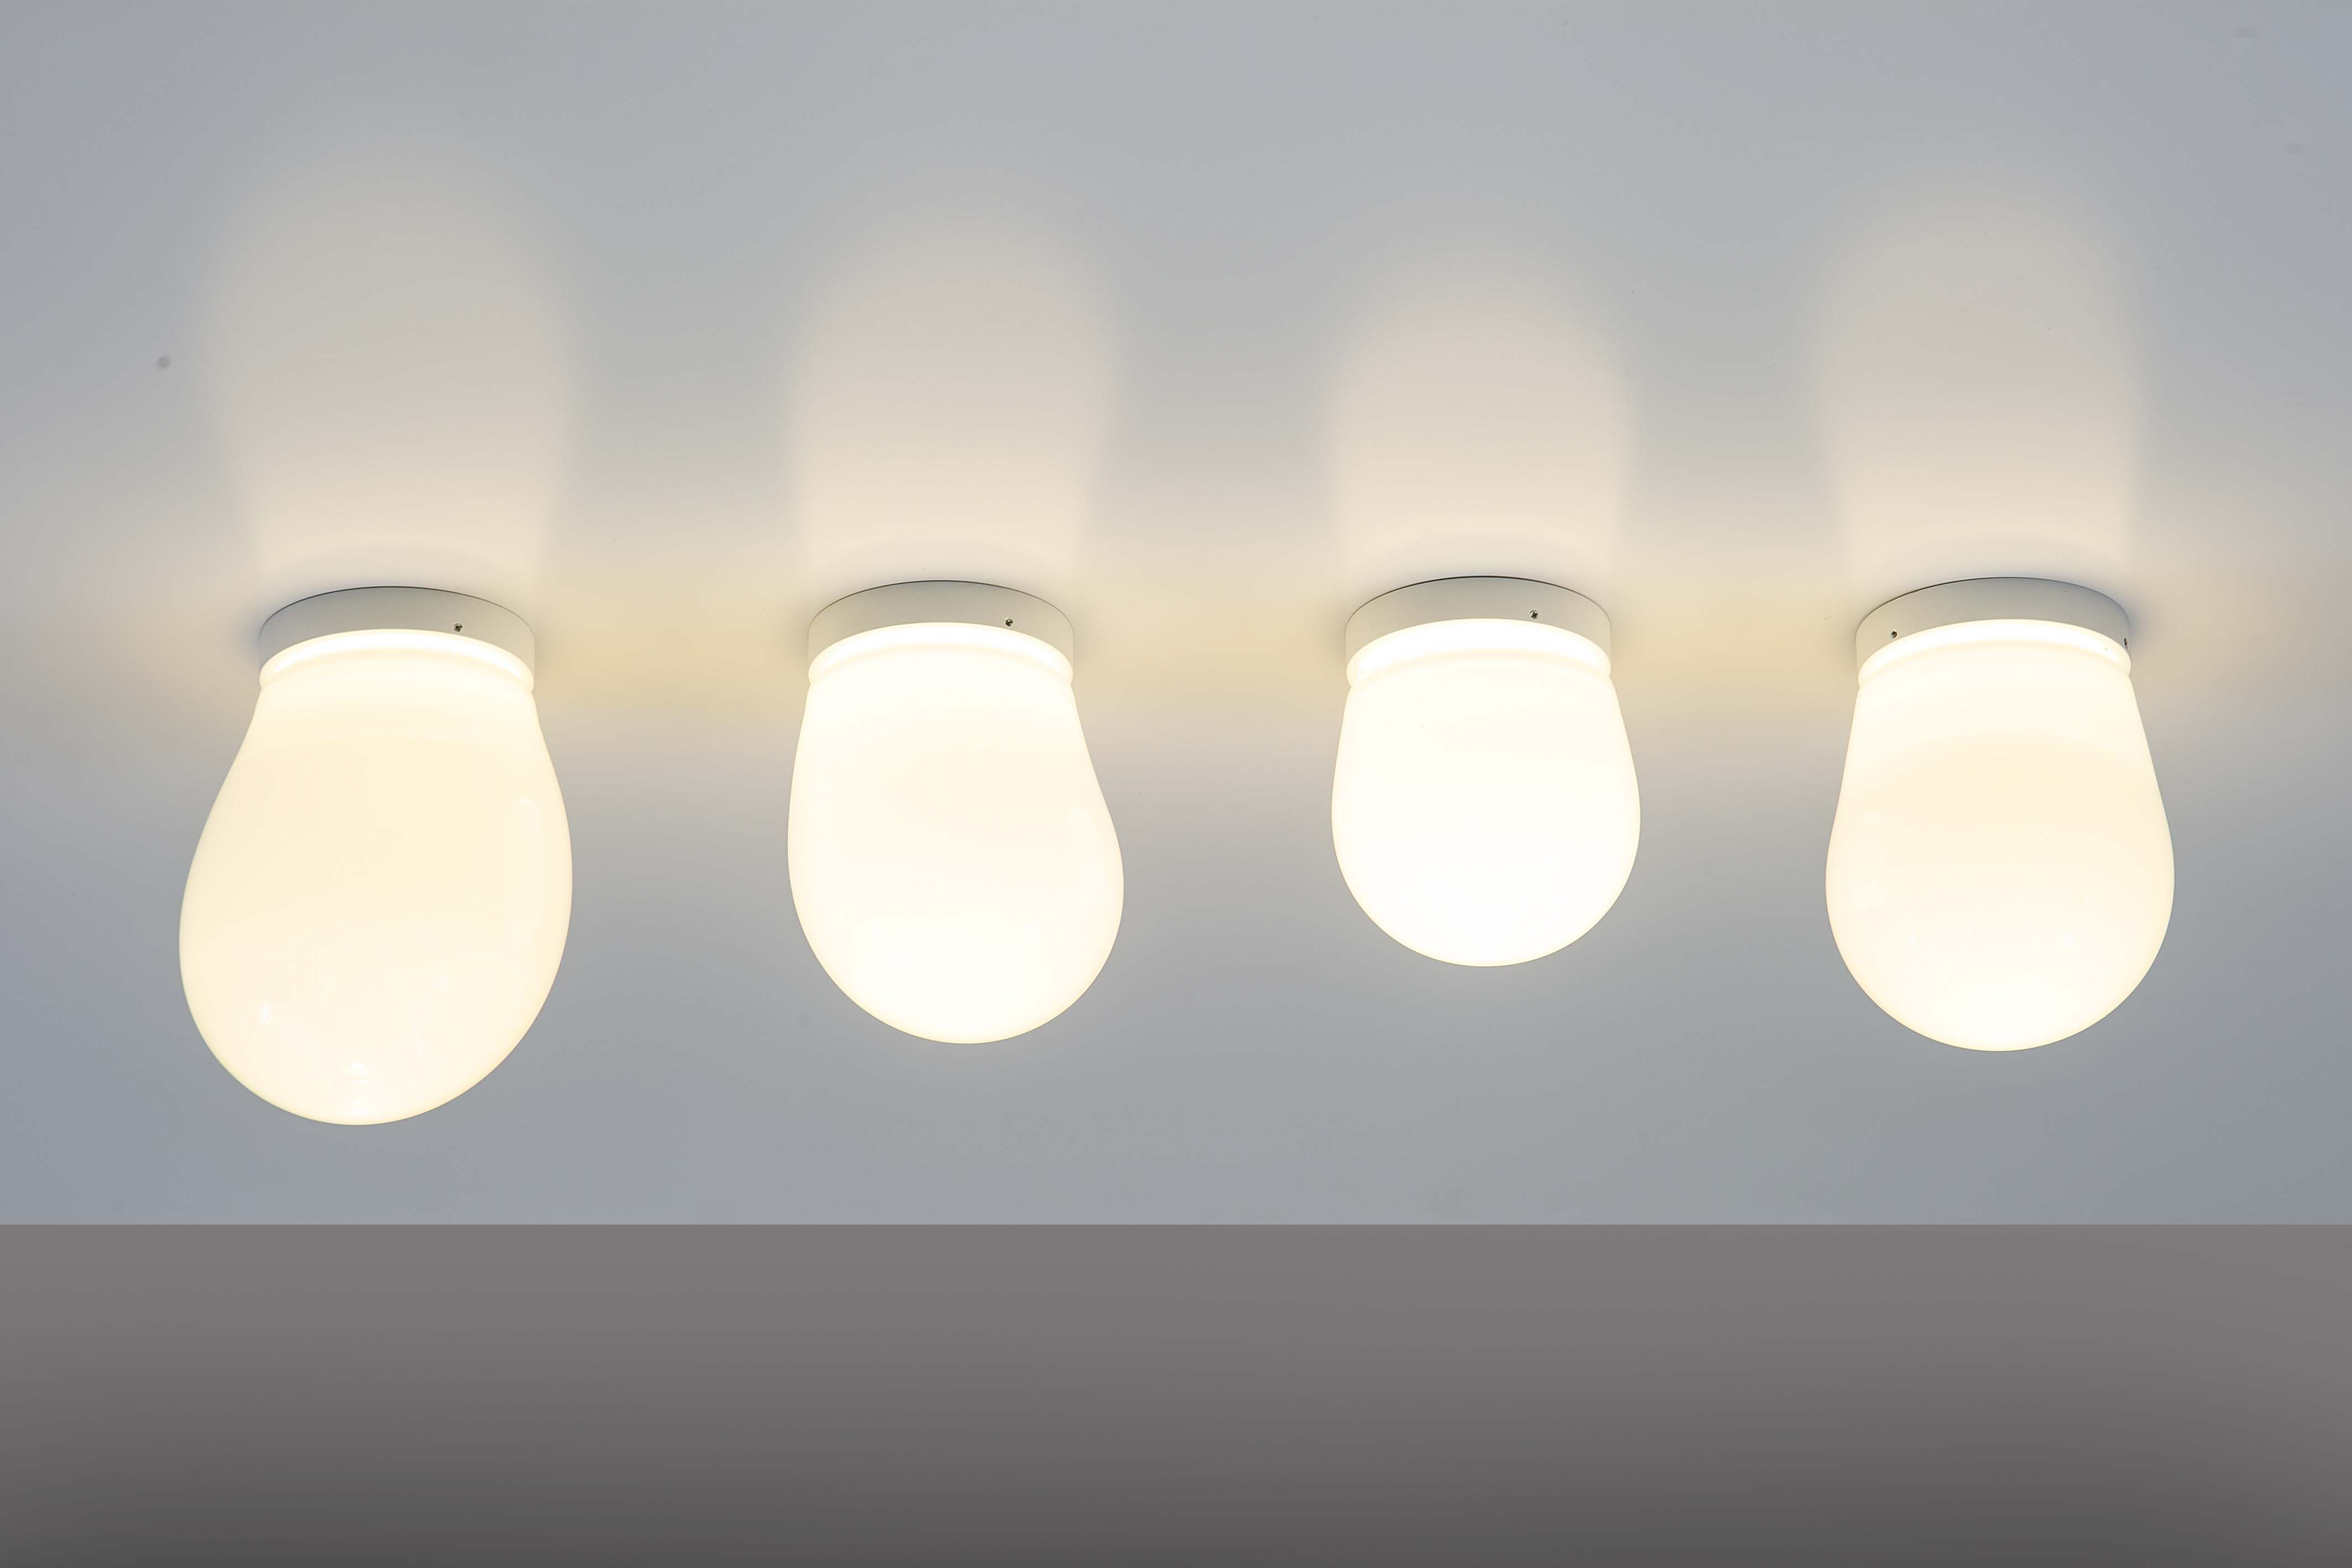 handmade lighting design. DROPZ   DARK® #lighting #design Alex De Witte For #DARK #glass Handmade Lighting Design O